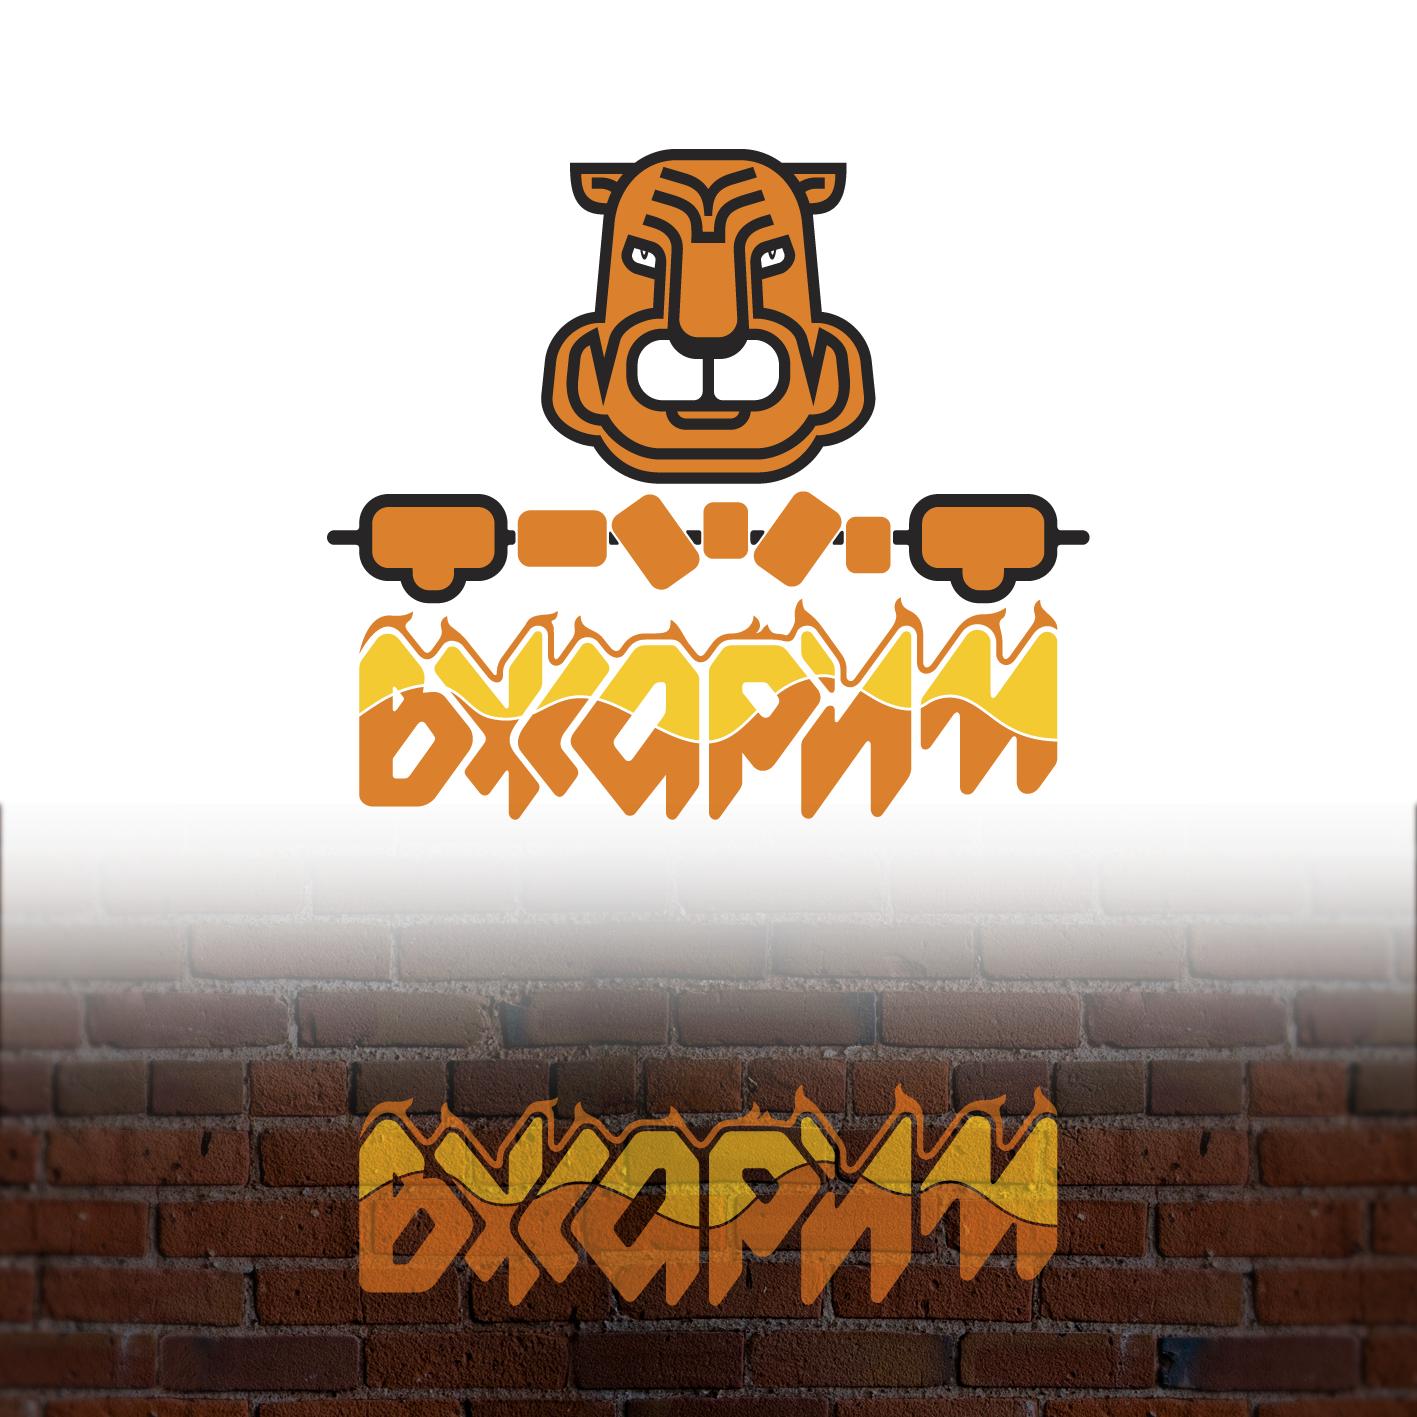 Требуется, разработка логотипа для крафт-кафе «ВЖАРИМ». фото f_092600c78d94c058.png